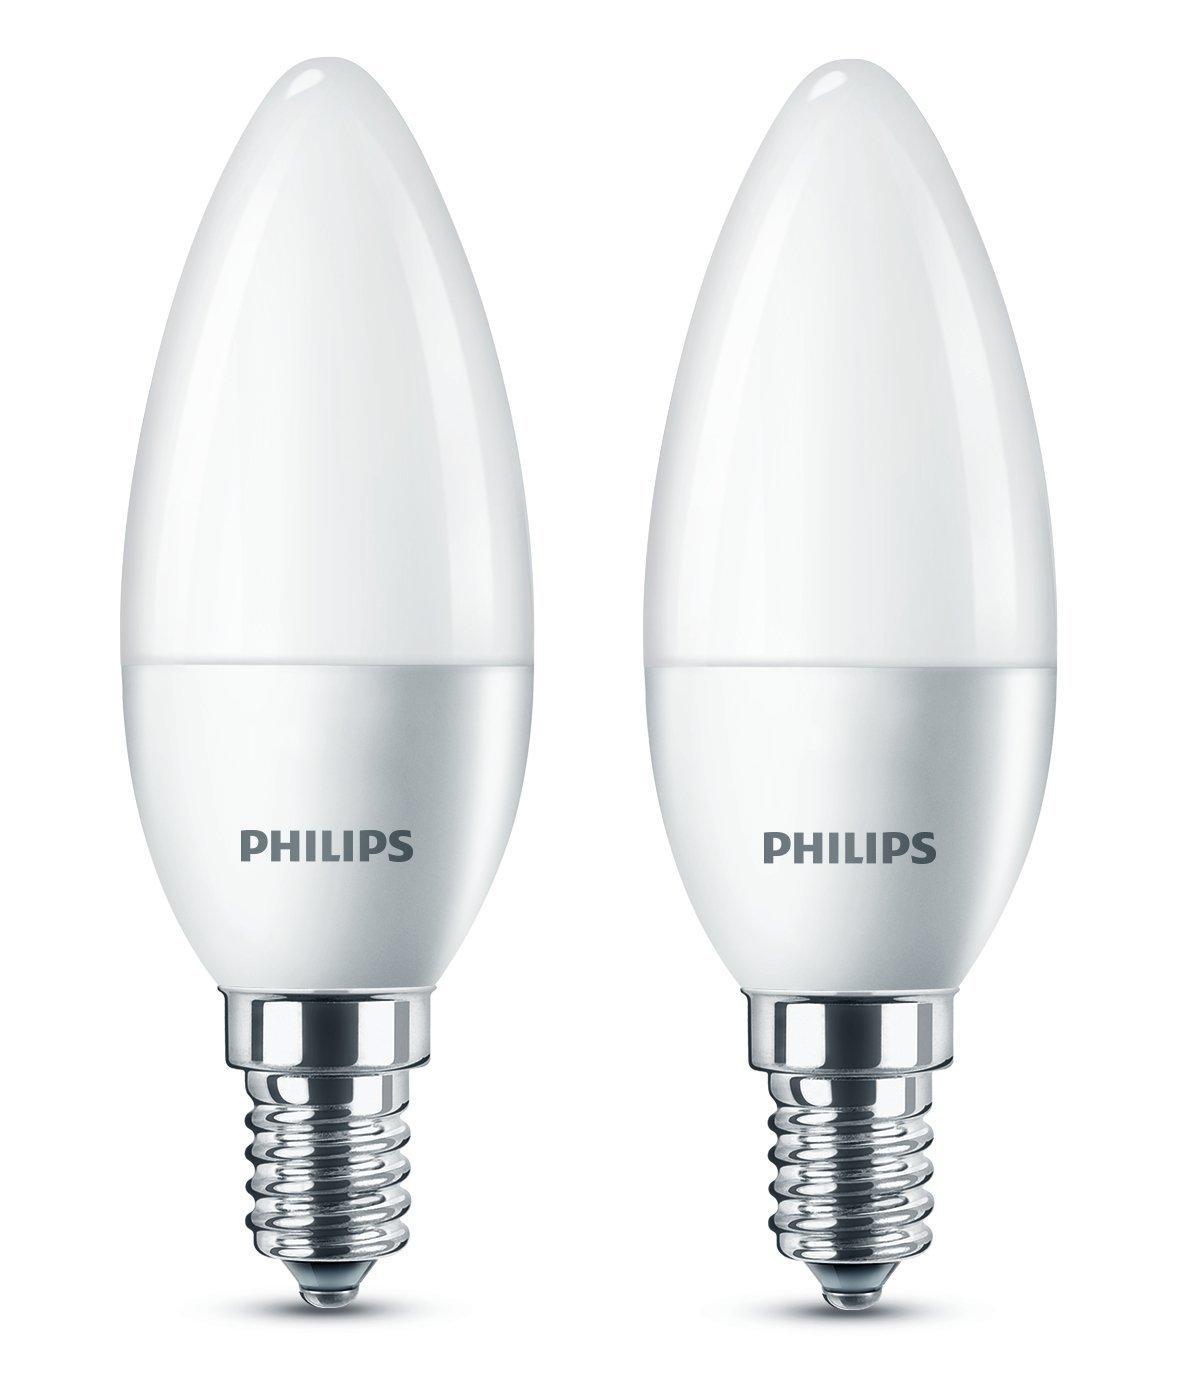 2er Pack Philips LED Glühbirne 5W=40W 470lm E27 A+ 2700K WarmWhite 15000hrs.